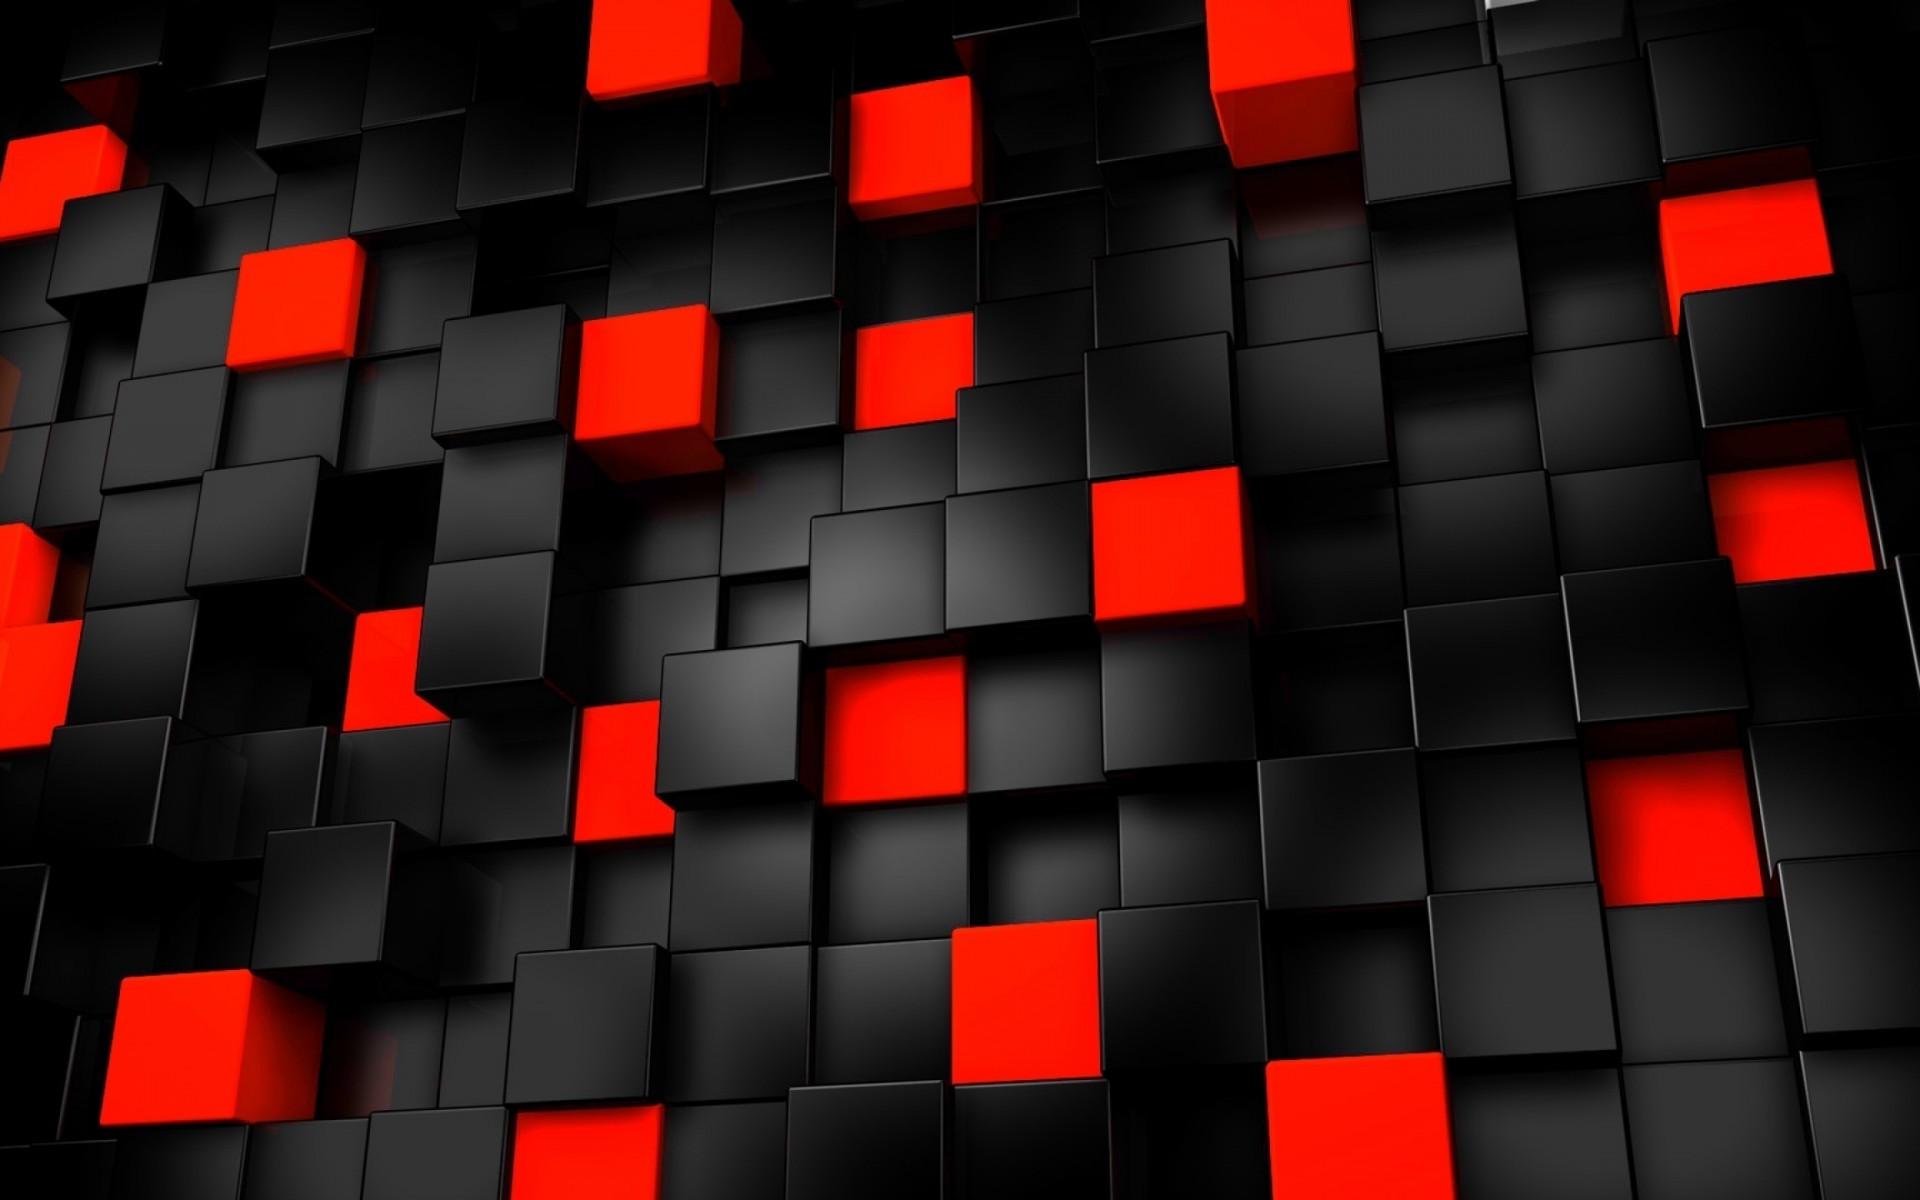 Abstract / 3D Wallpaper